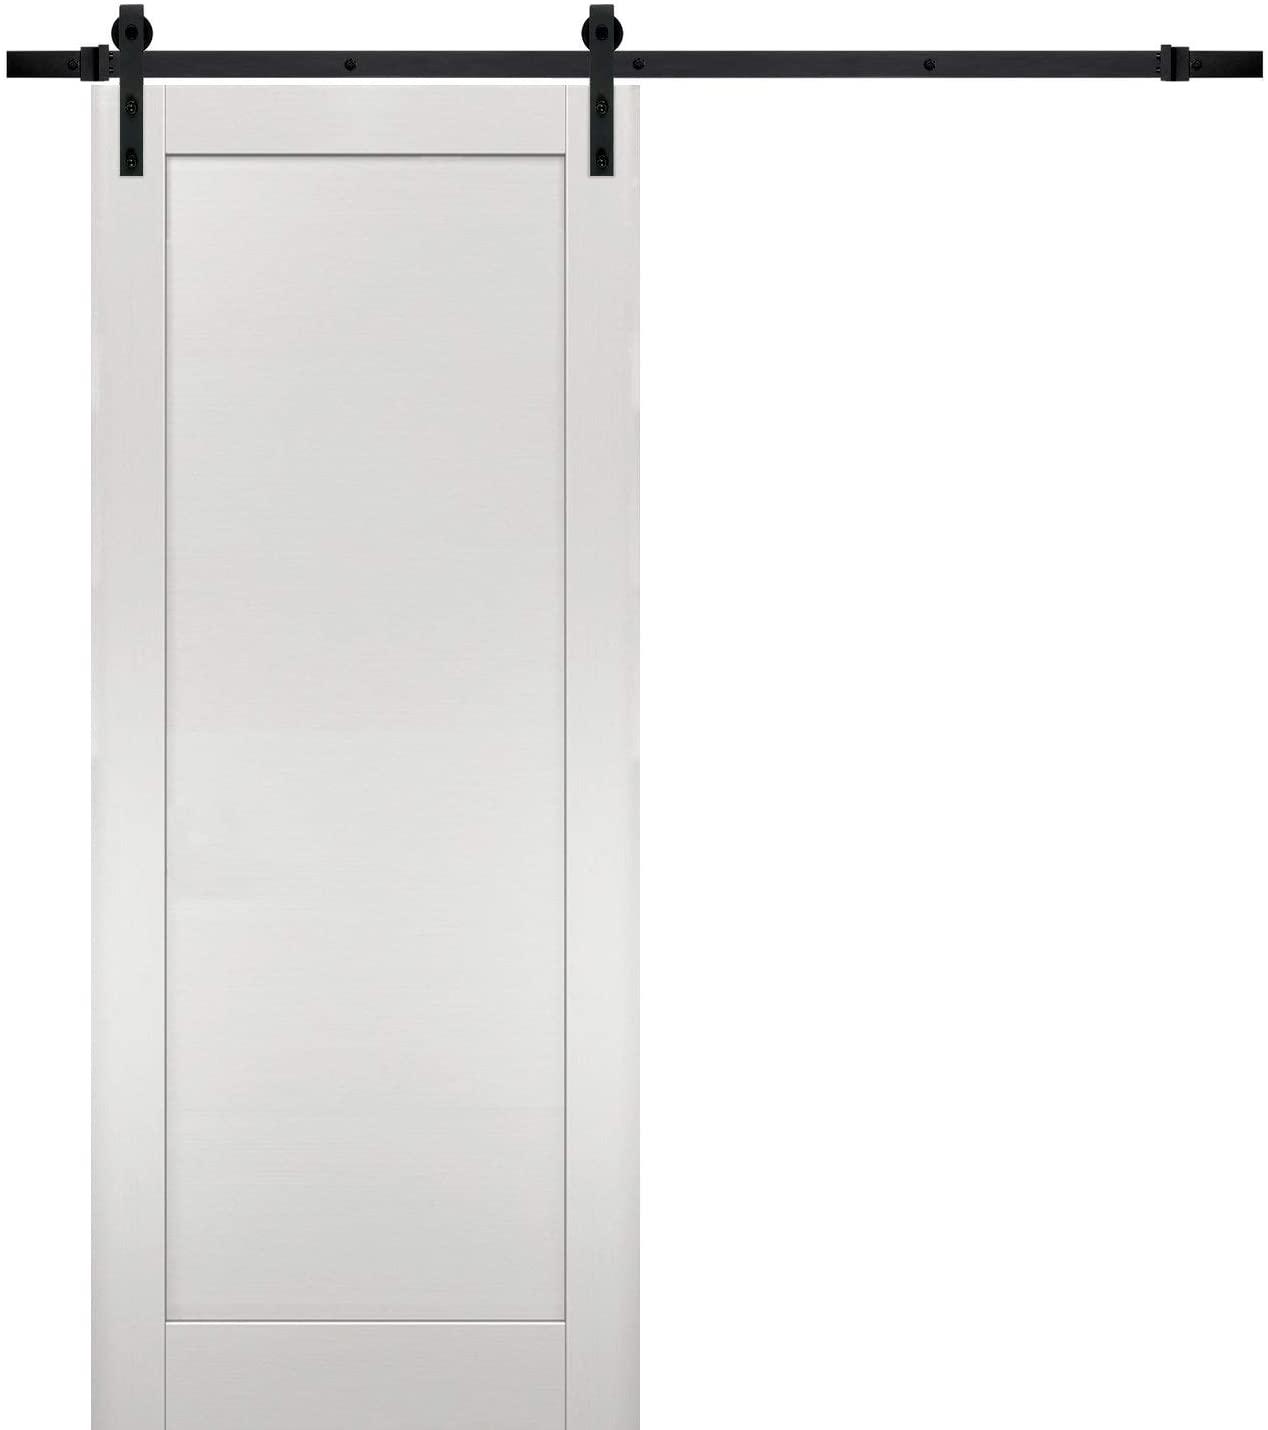 Sliding Barn Door 24 x 80 with Hardware   Quadro 4111 White Ash   Top Mount 6.6FT Rail Hangers Sturdy Set   Modern Solid Panel Interior Doors